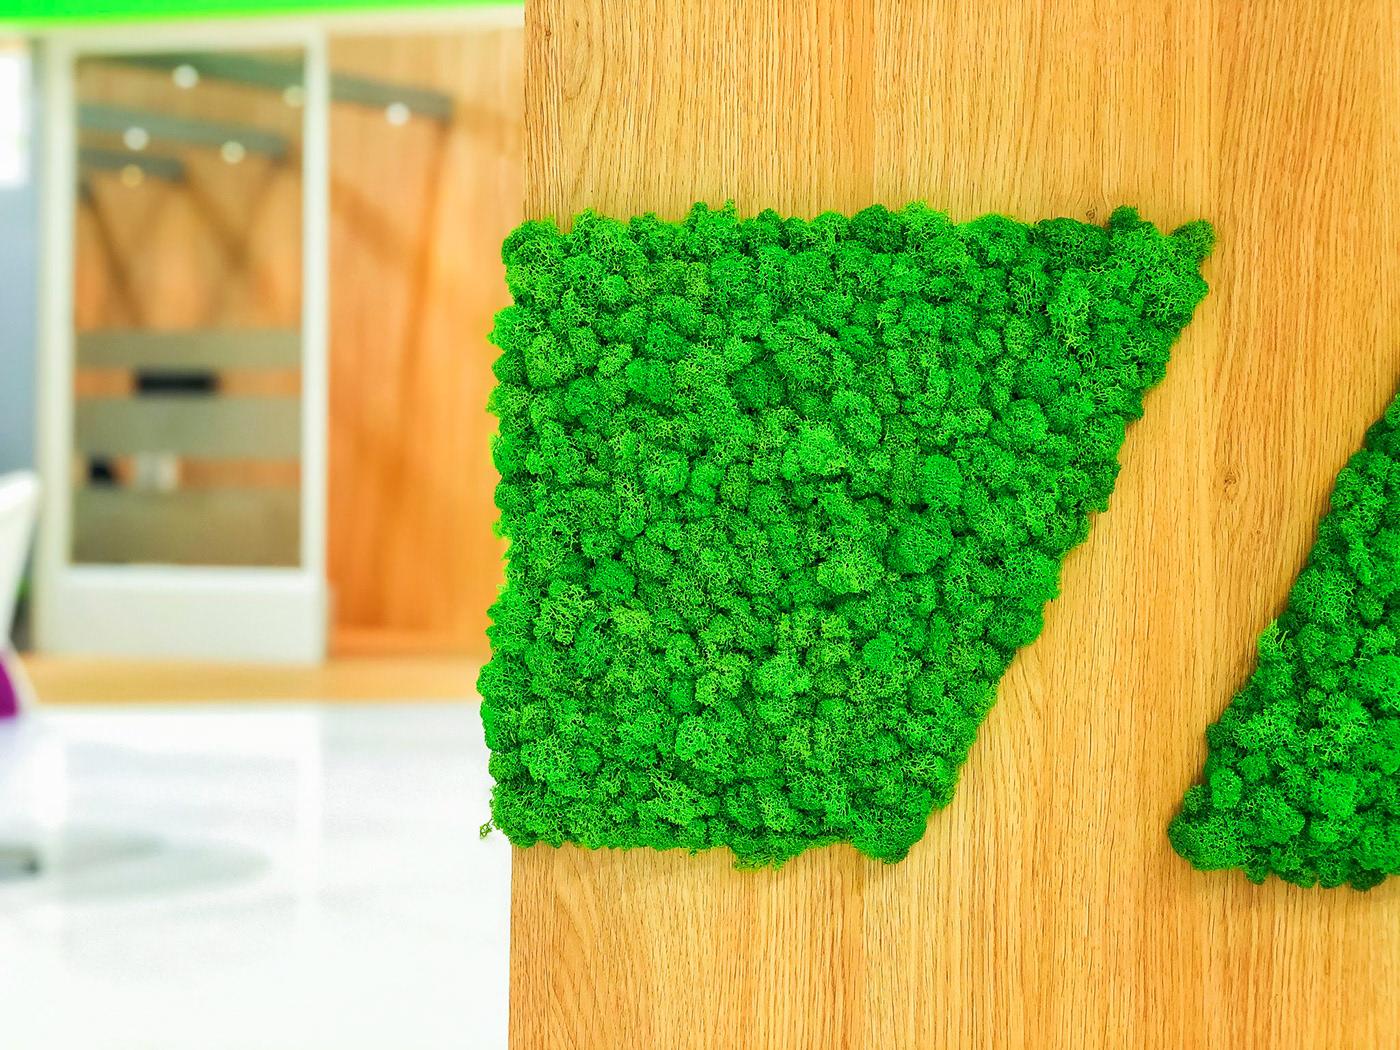 Stand Exhibition  Frankfurt moss expo ISH2019 TesyBulgaria MechkuevDesign 3DeaDesignStudio